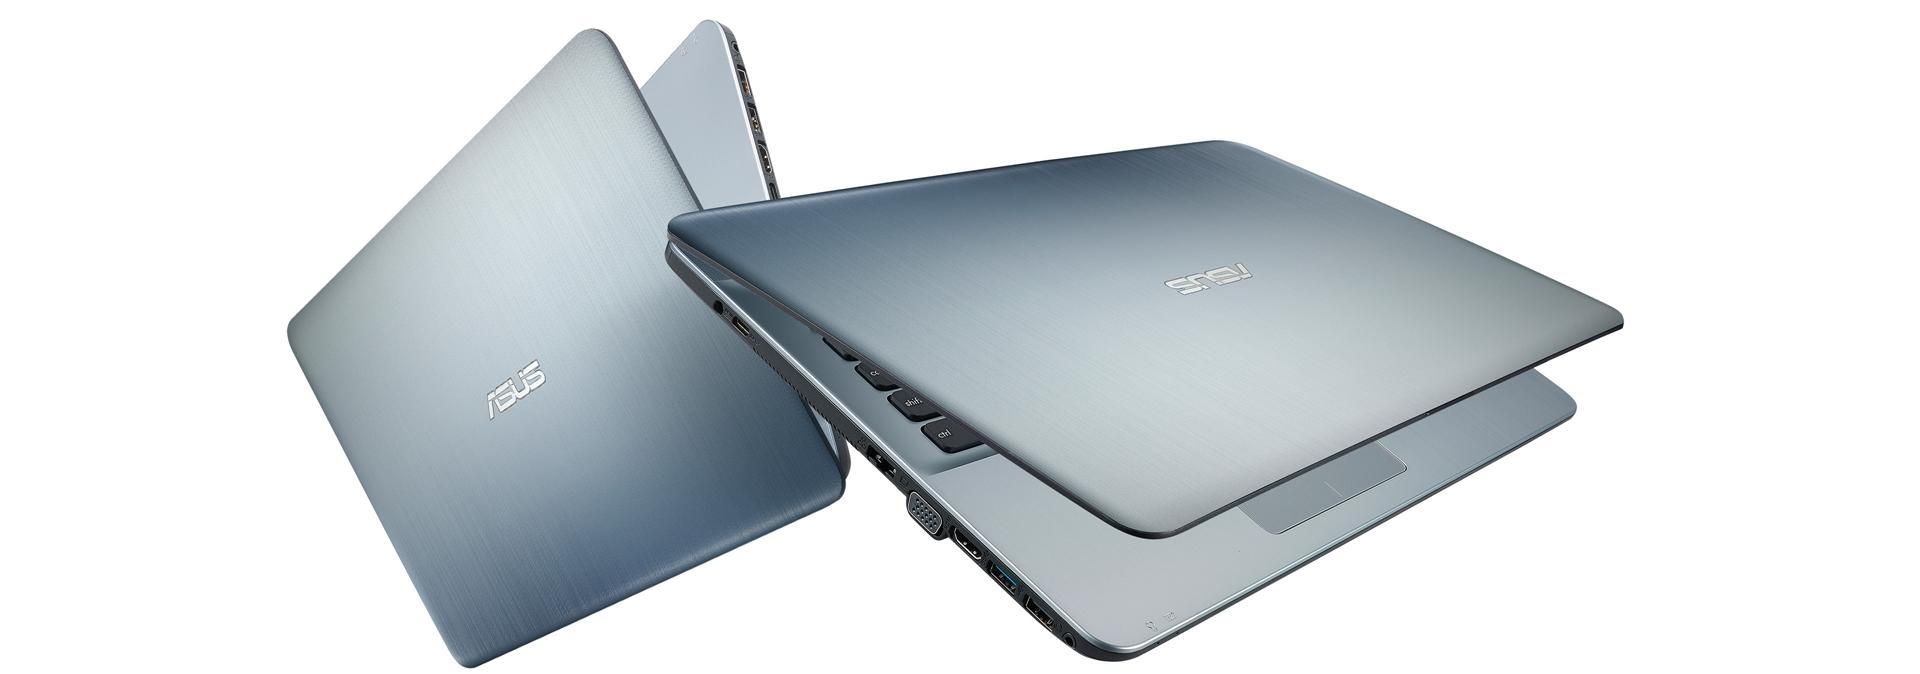 Asus X441NA-BX402 - Silver